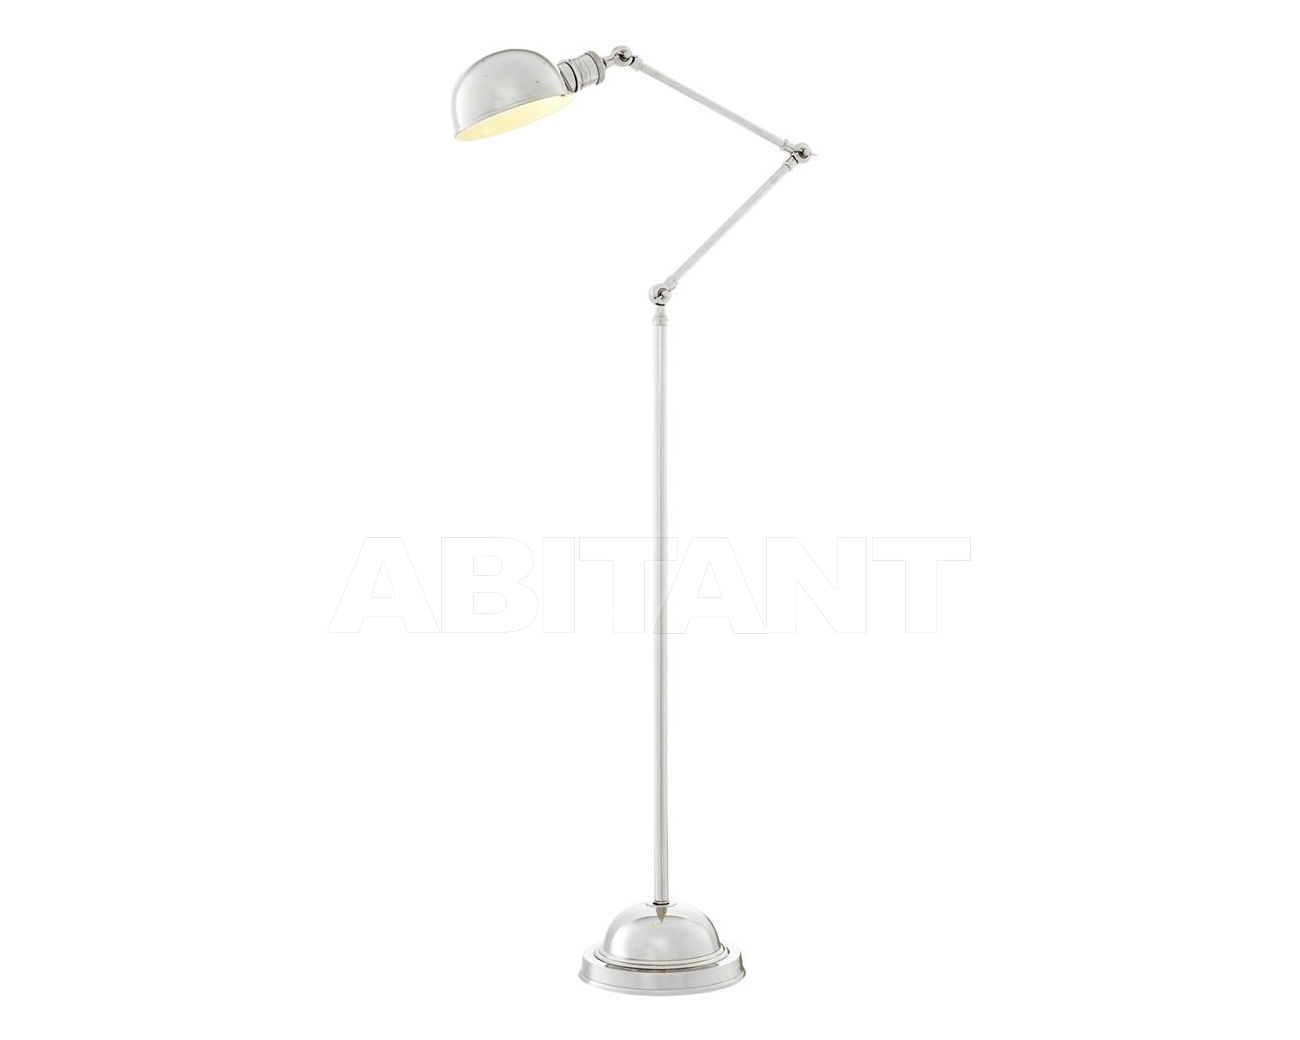 Купить Лампа напольная Soho Eichholtz  Lighting 101487